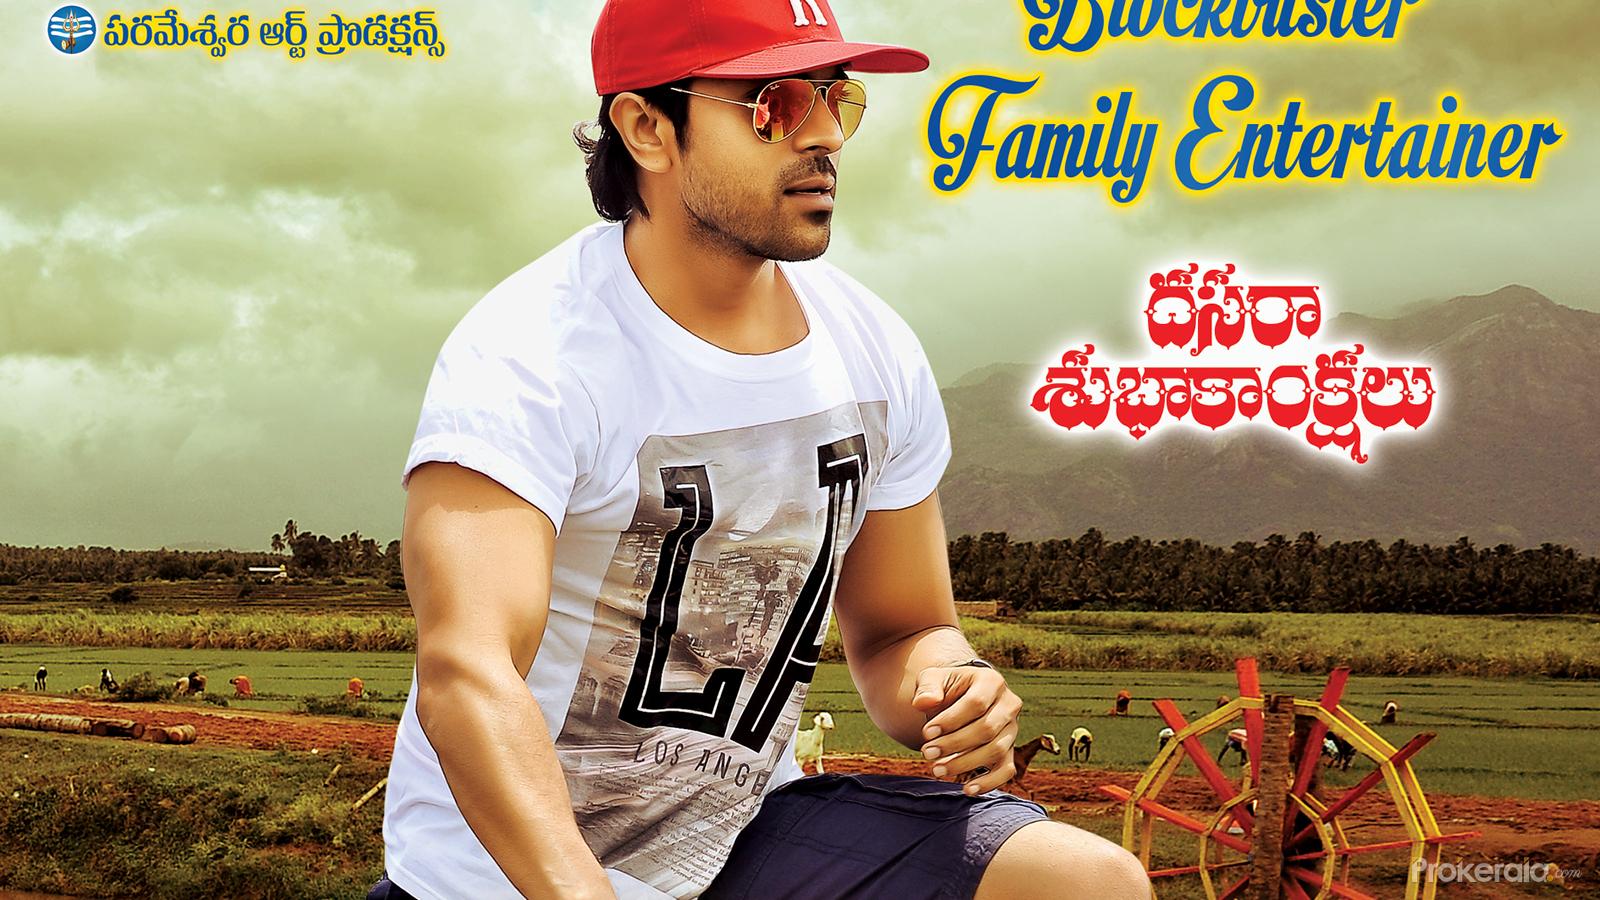 Tamil movie ram charan download - Hetty wainthropp episode guide